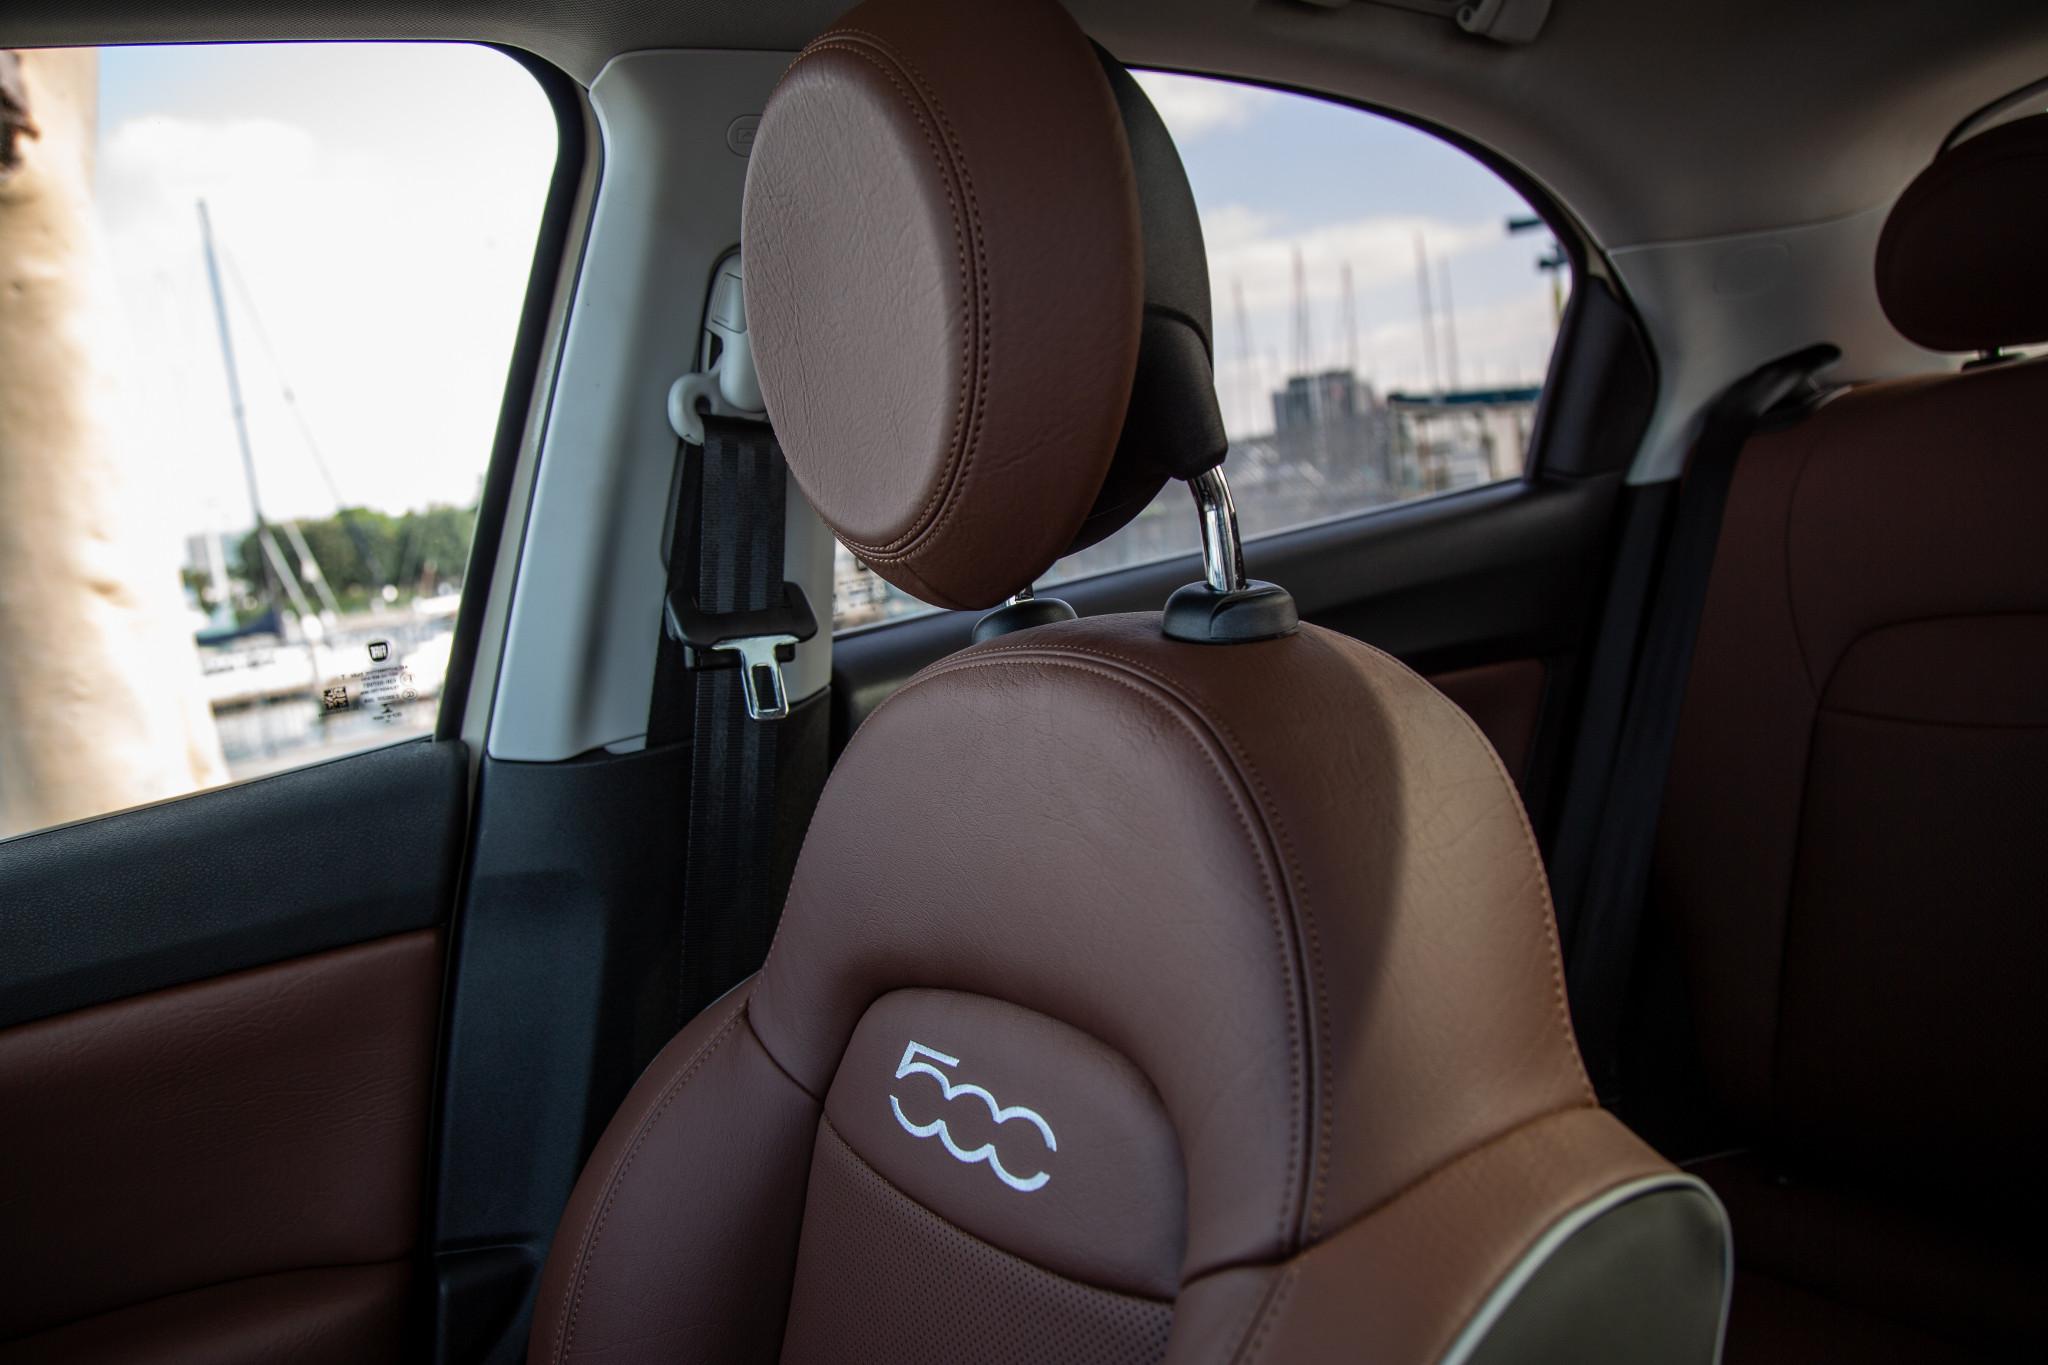 fiat-500x-2020-19-front-row--interior--seat.jpg